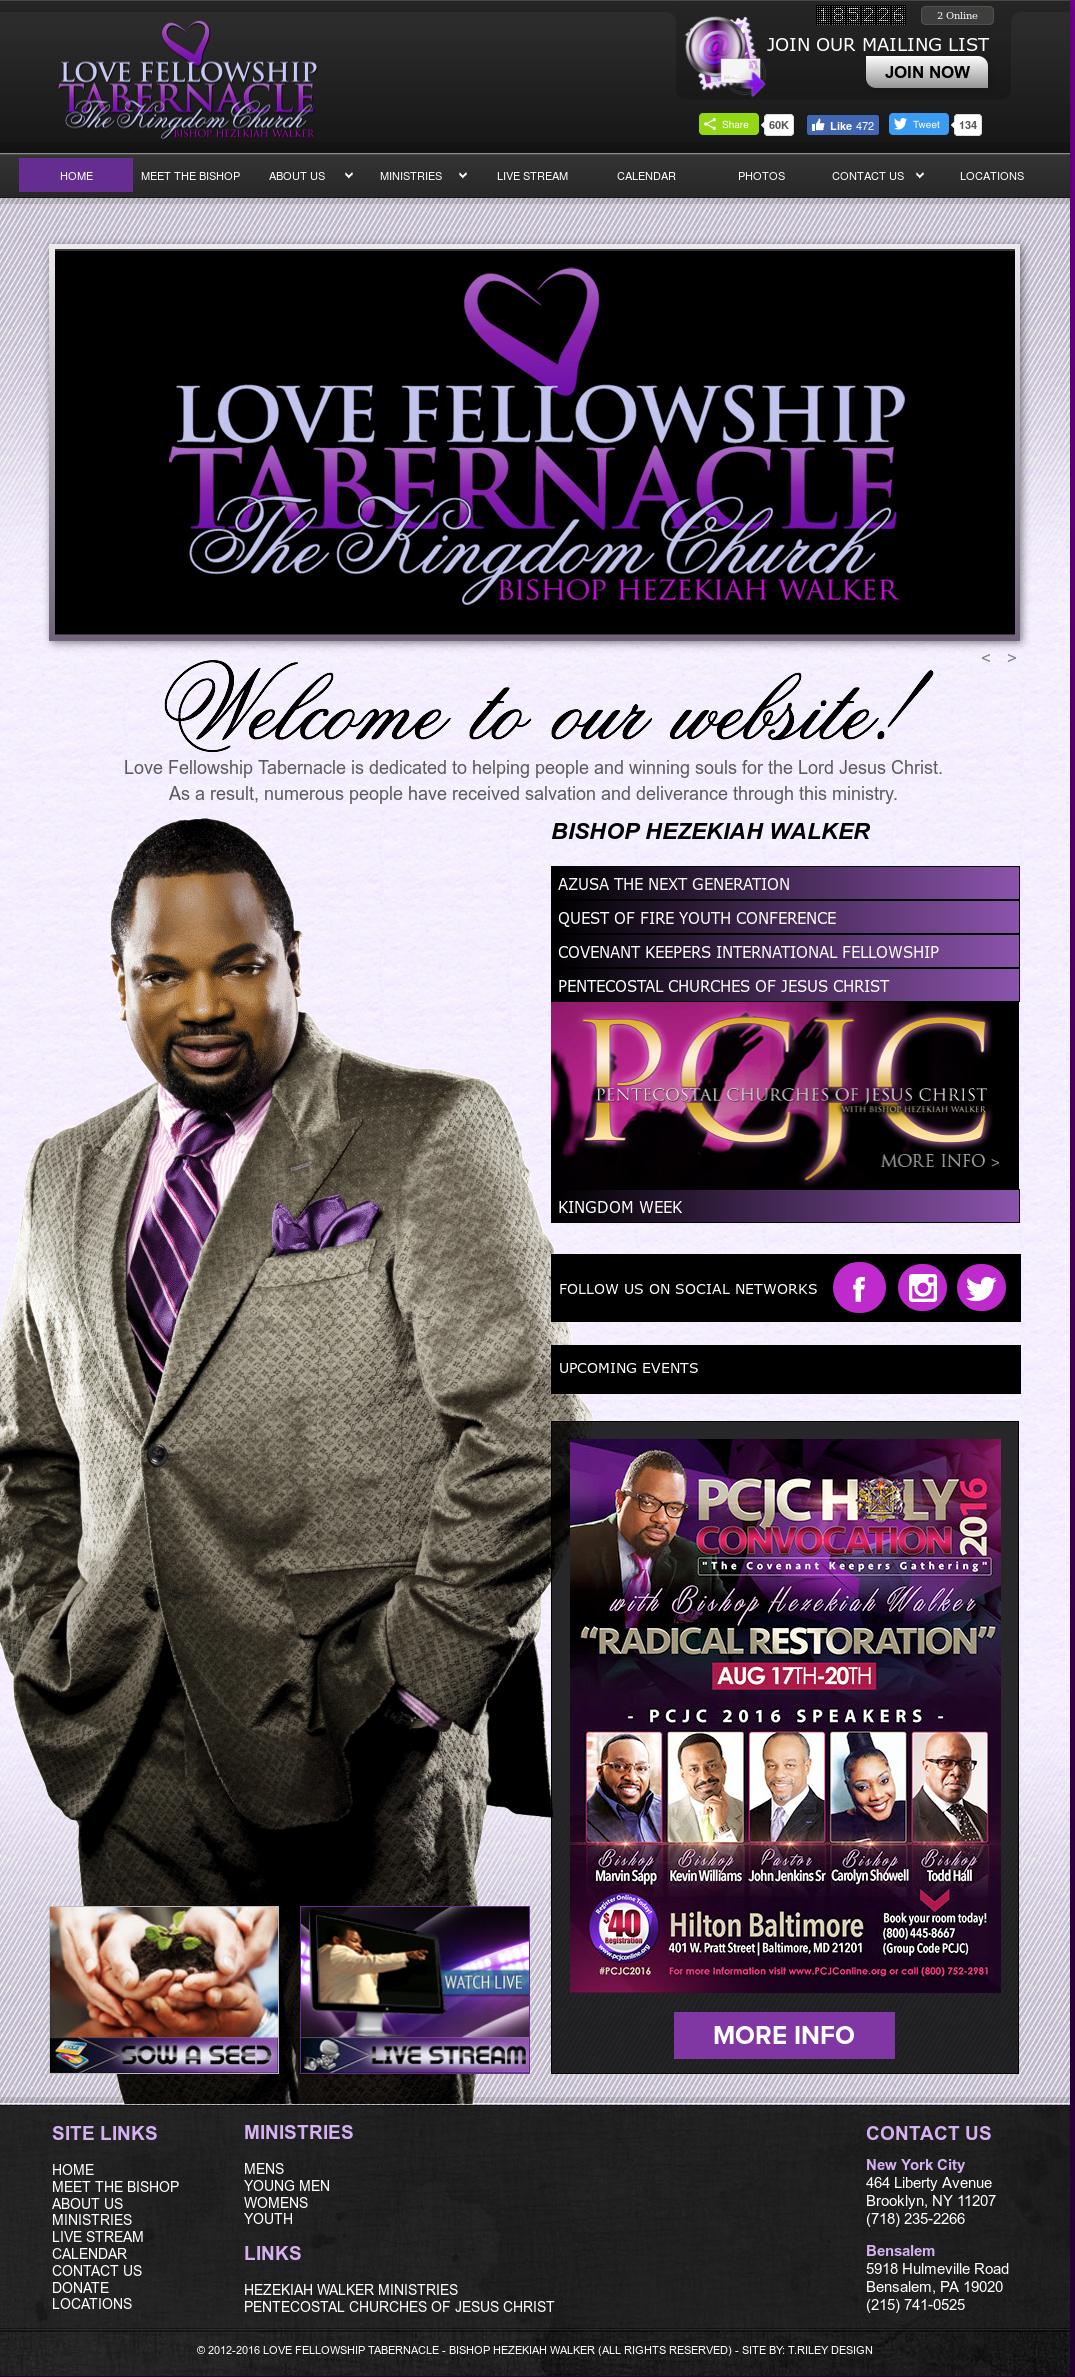 AirTalk® | Online dating | KPCC